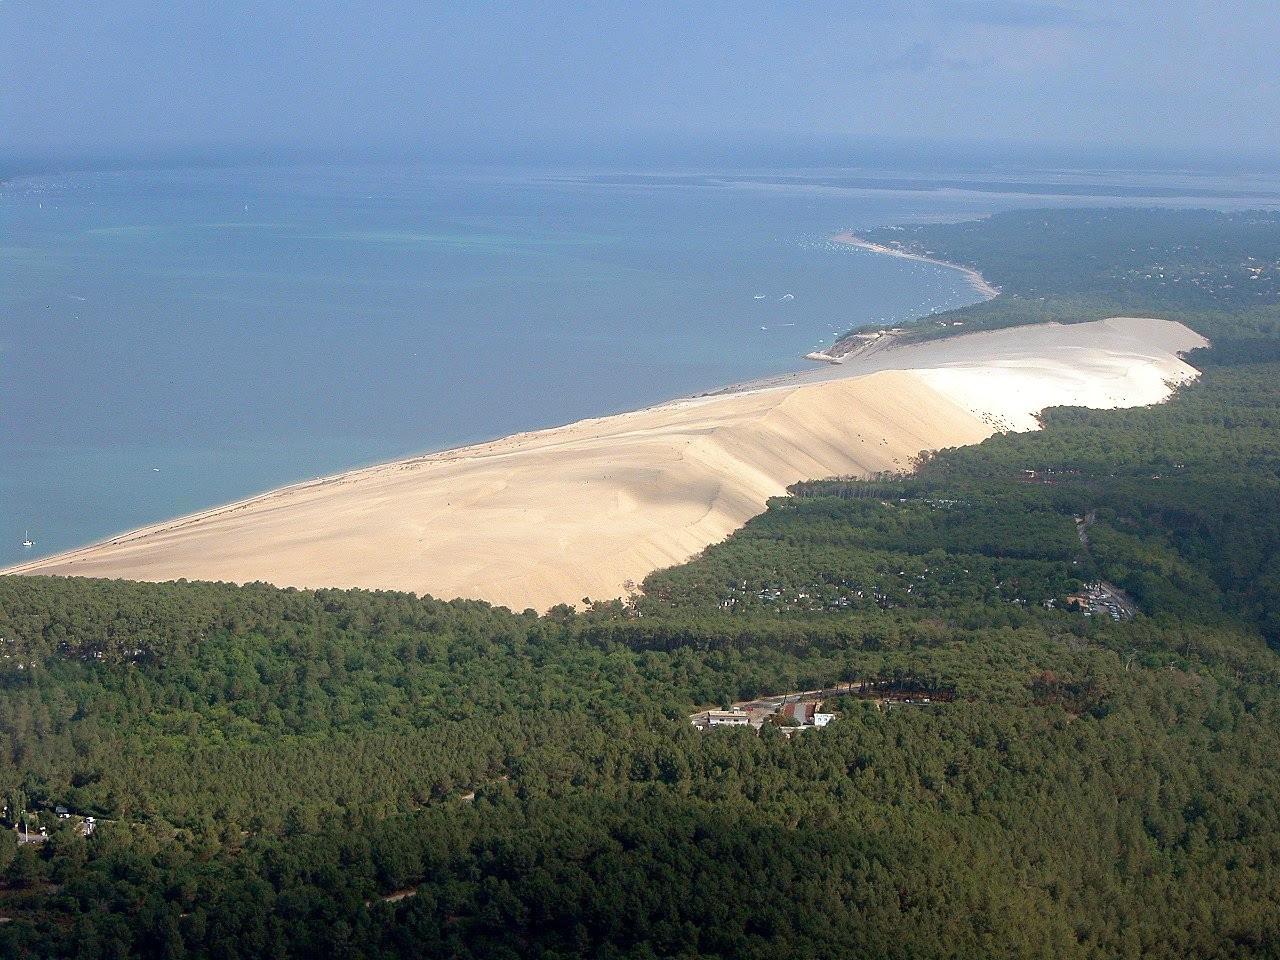 Vy3ML Dune de Pyla   A new Sahara desert being born   in France! [30 pics]